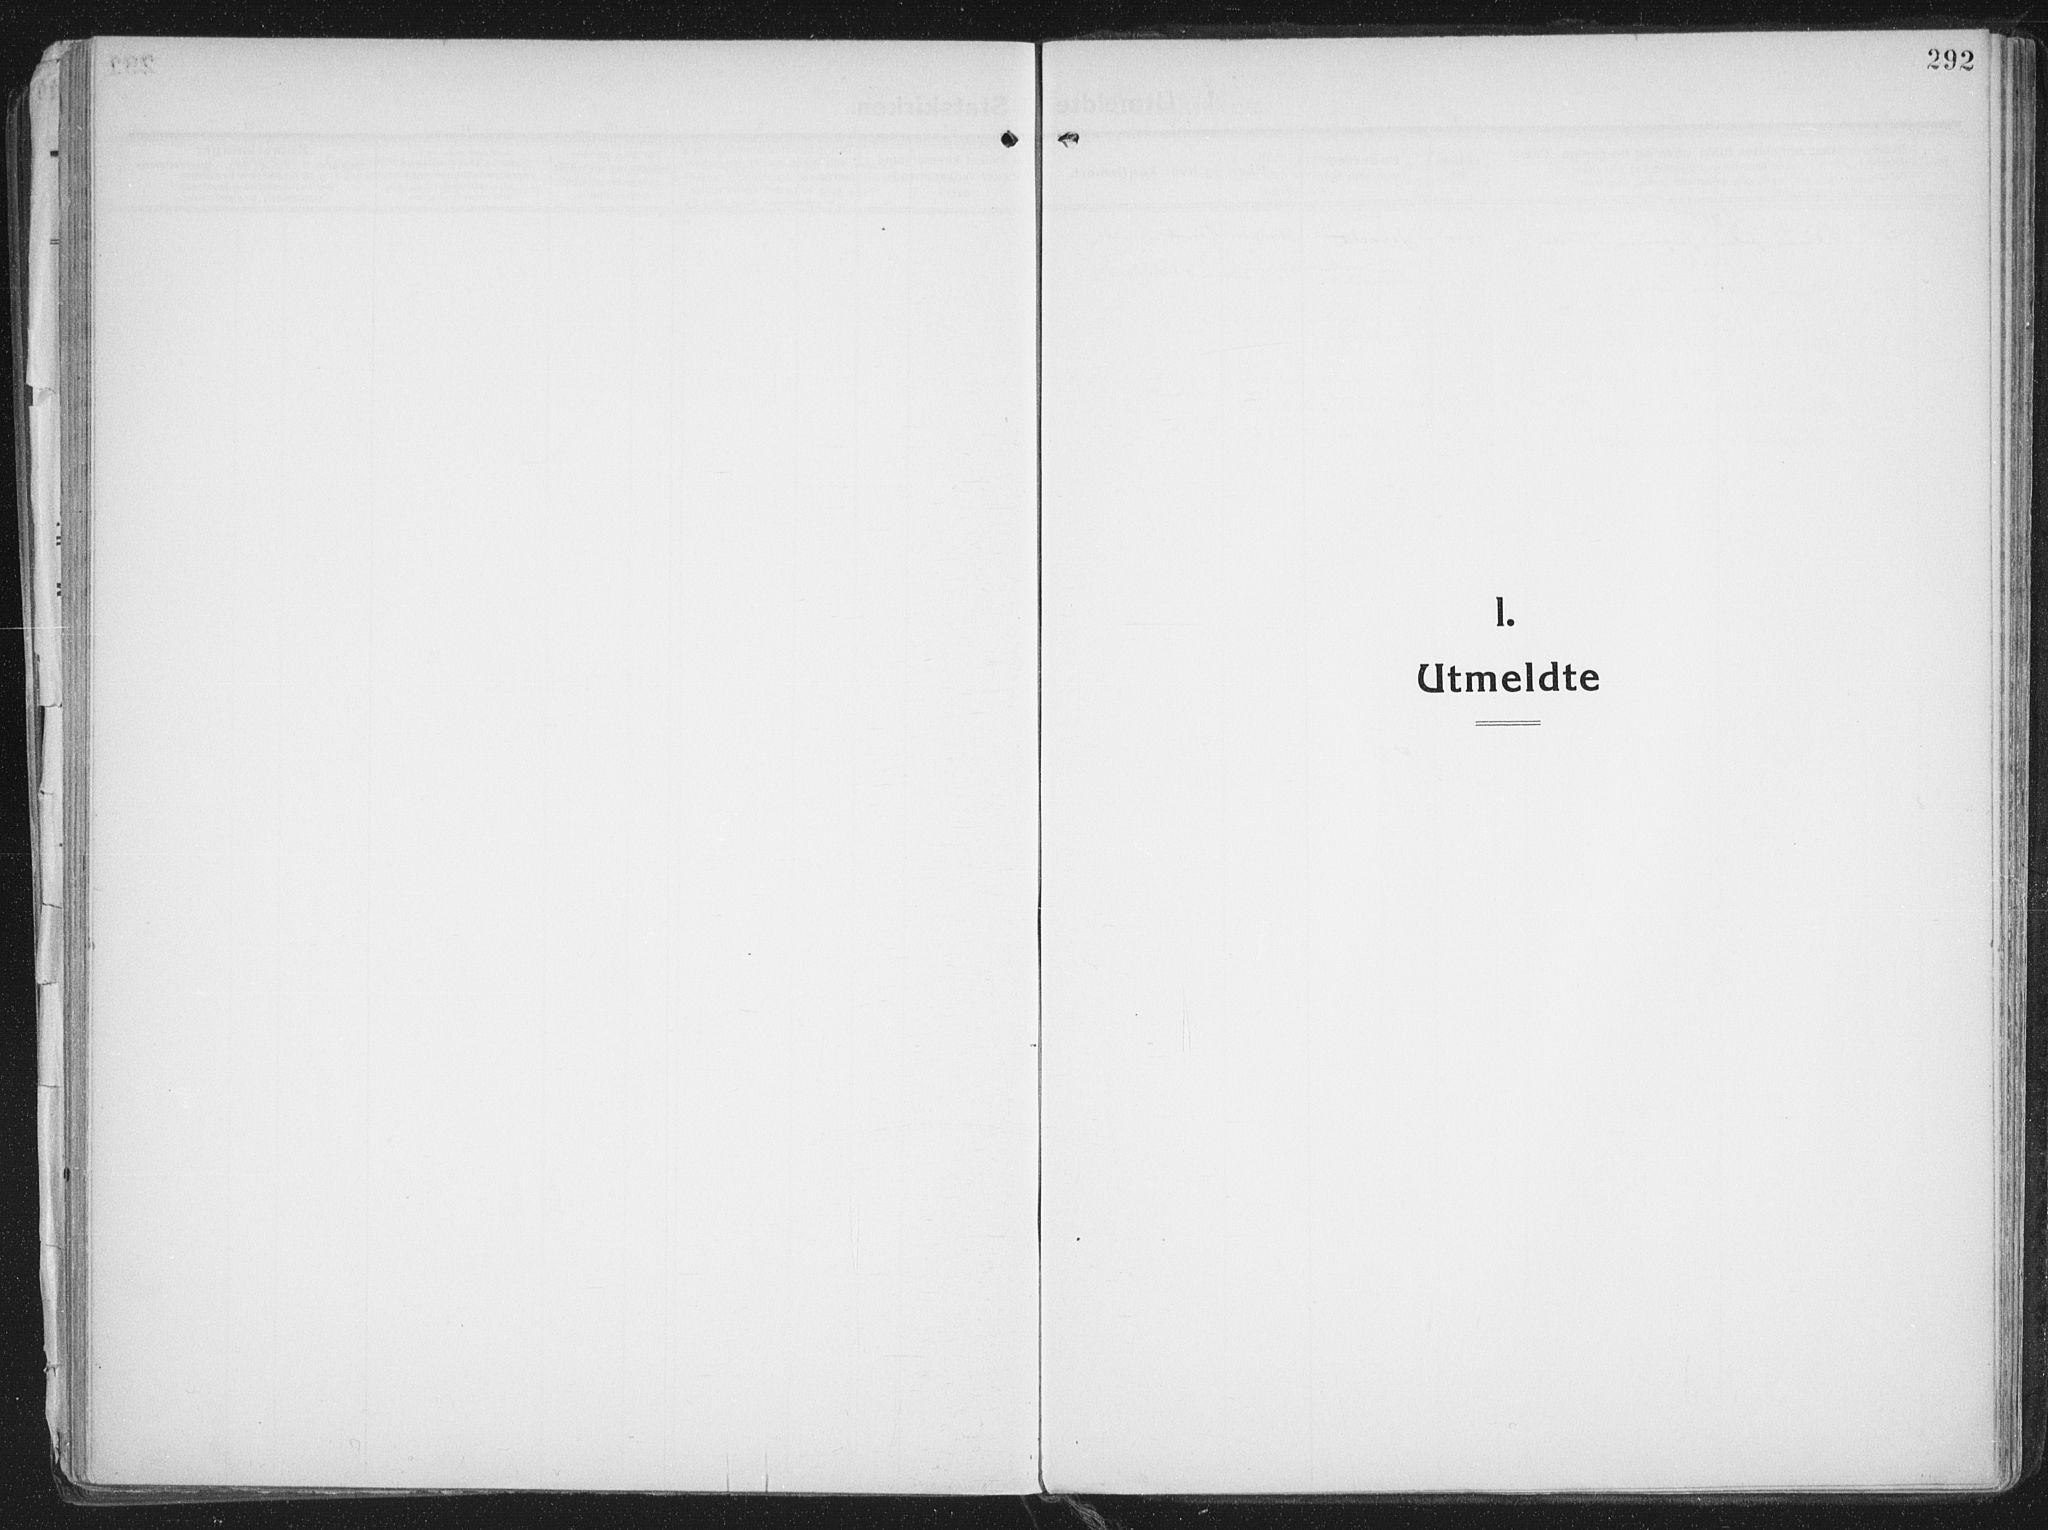 SATØ, Lenvik sokneprestembete, H/Ha: Ministerialbok nr. 16, 1910-1924, s. 292